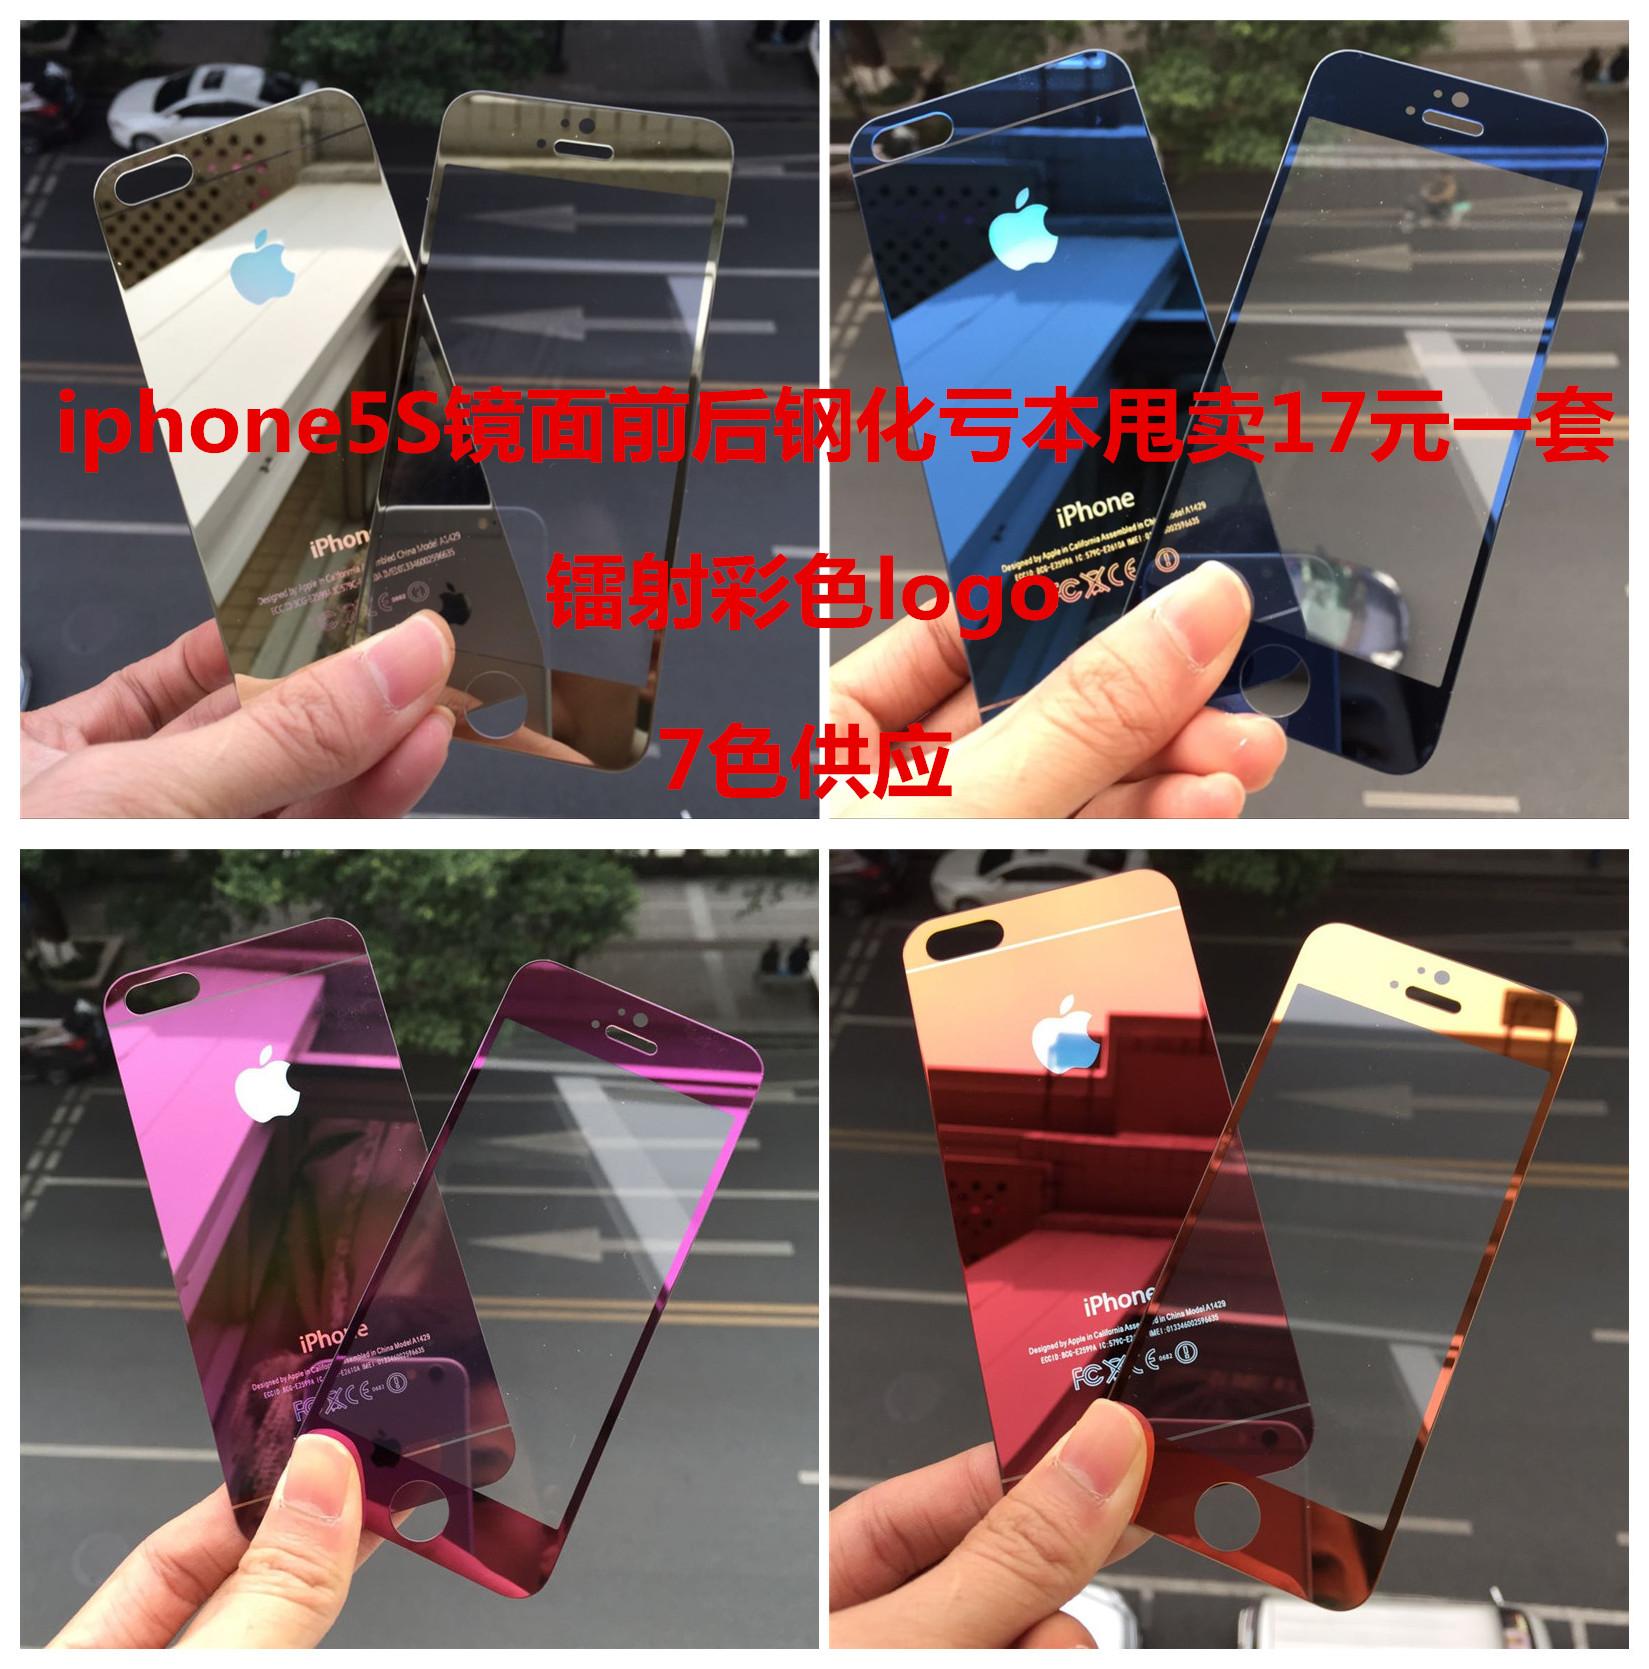 Apple защитная плёнка для iPad Apple  Iphone5s 5S Iphone5 чехол apple leather sleeve для ipad pro 10 5 платиново серый mpu02zm a